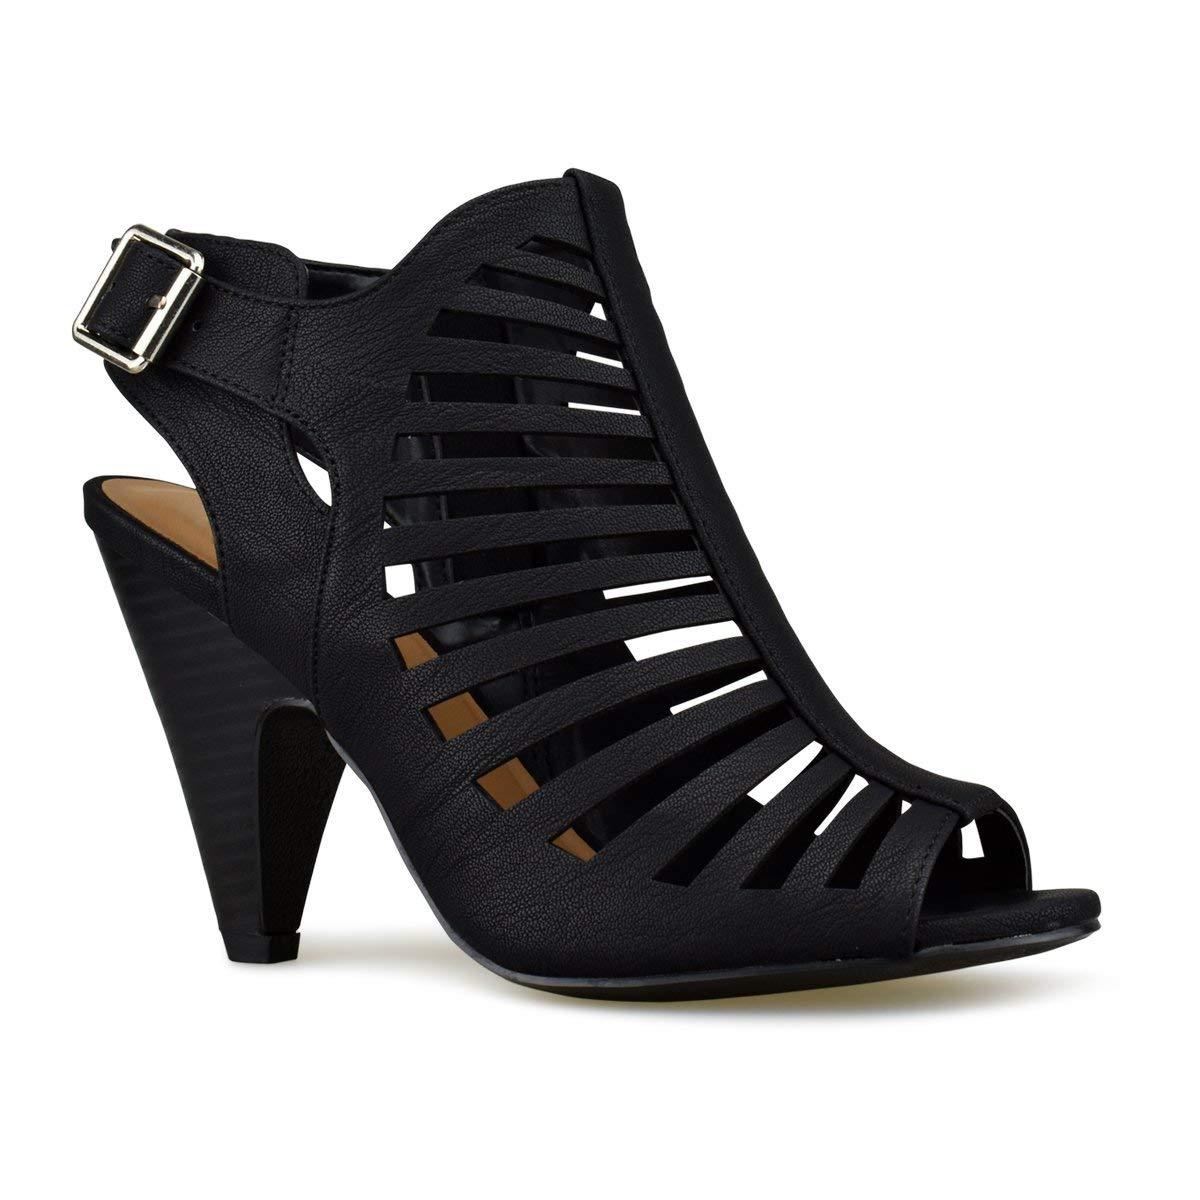 Premier Standard Women's Strappy Open Toe High Heel - Sexy Stacked Wood Sandal - Vegan Leather Cutout Shoe